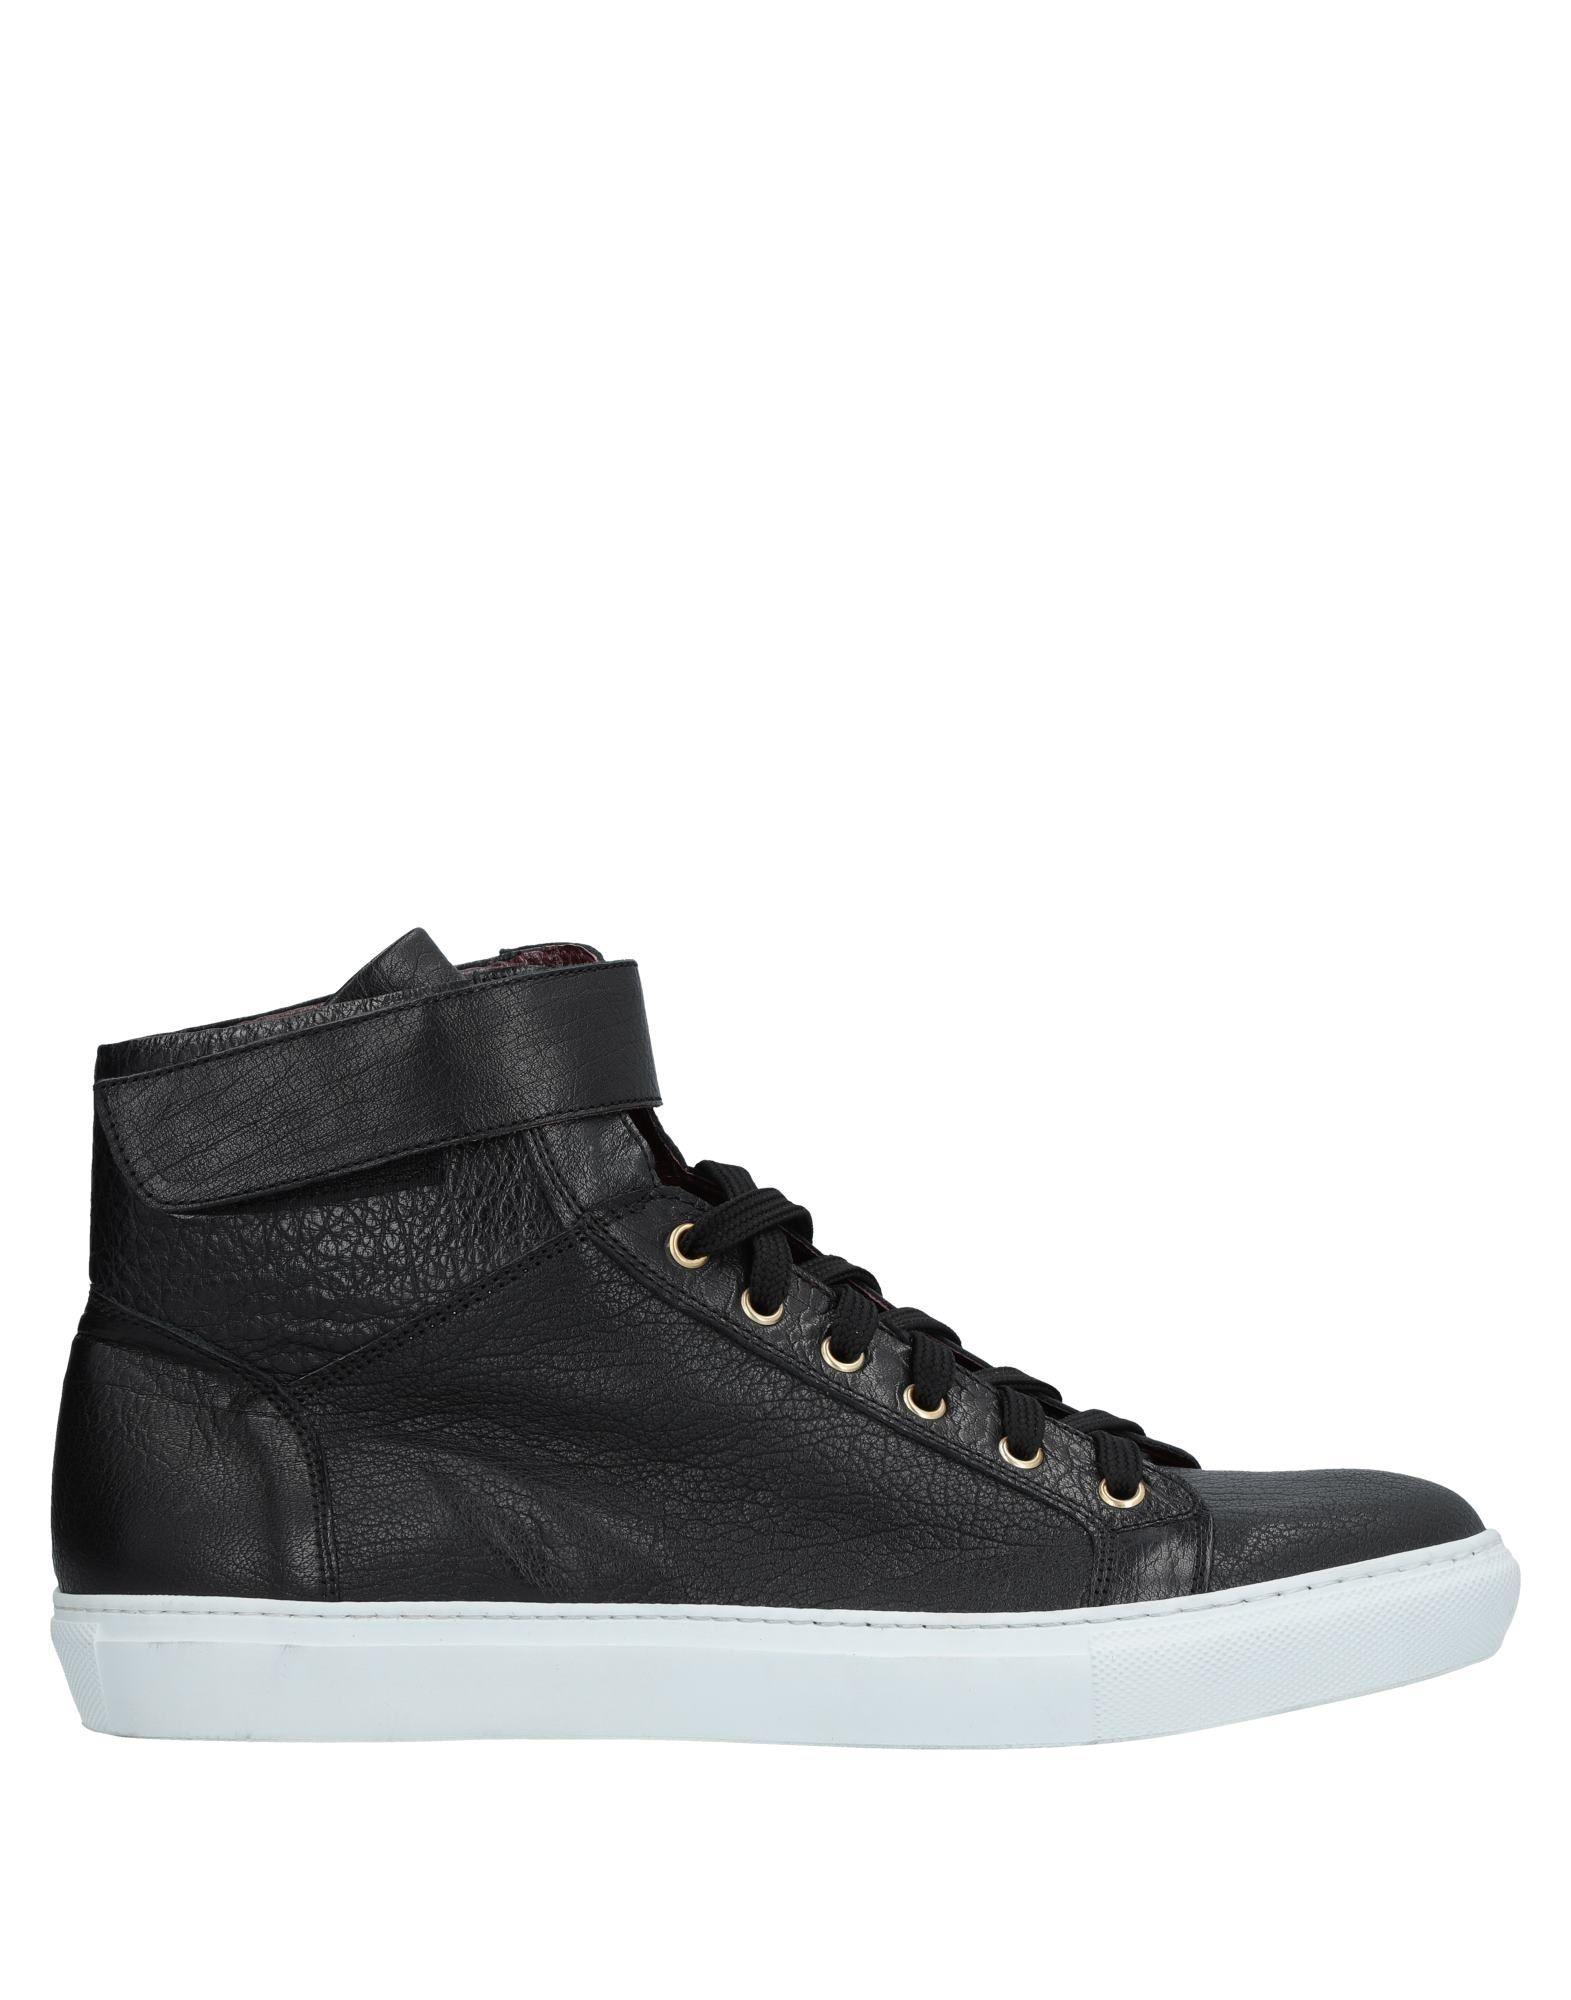 Tsd12 Sneakers Herren  11537438PI Gute Qualität beliebte Schuhe